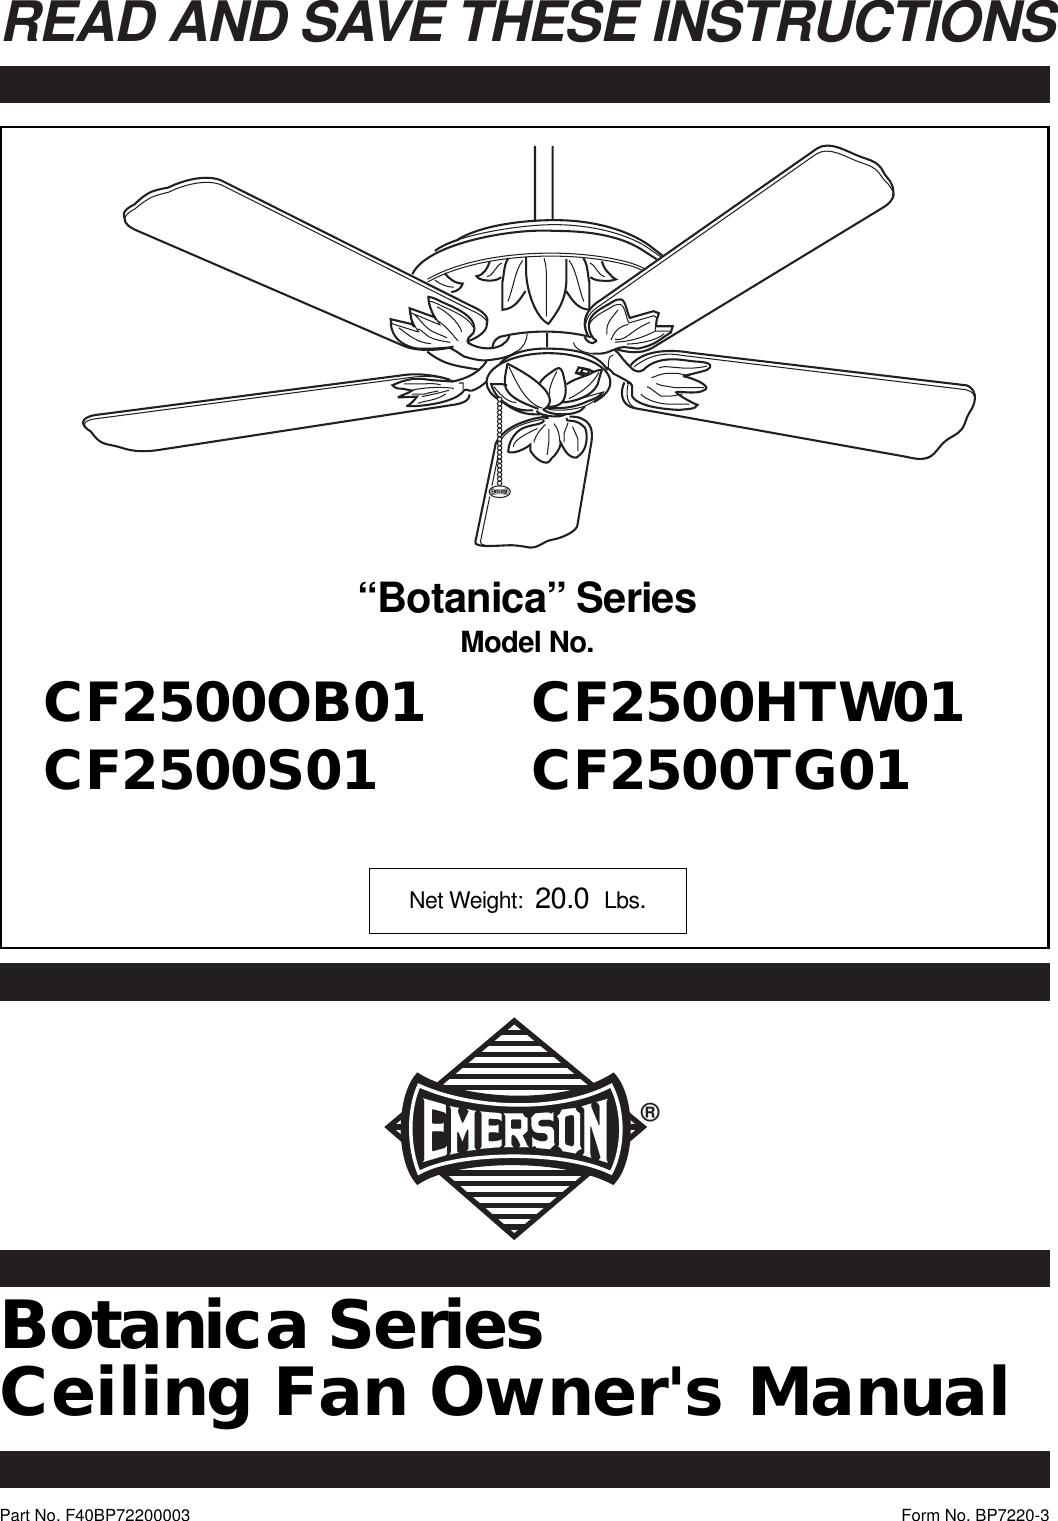 Emerson Sw375 Fan Wiring Diagrams Electrical Diagram Cf2500htw01 Owners Manual Bp7220 Cf2500 A